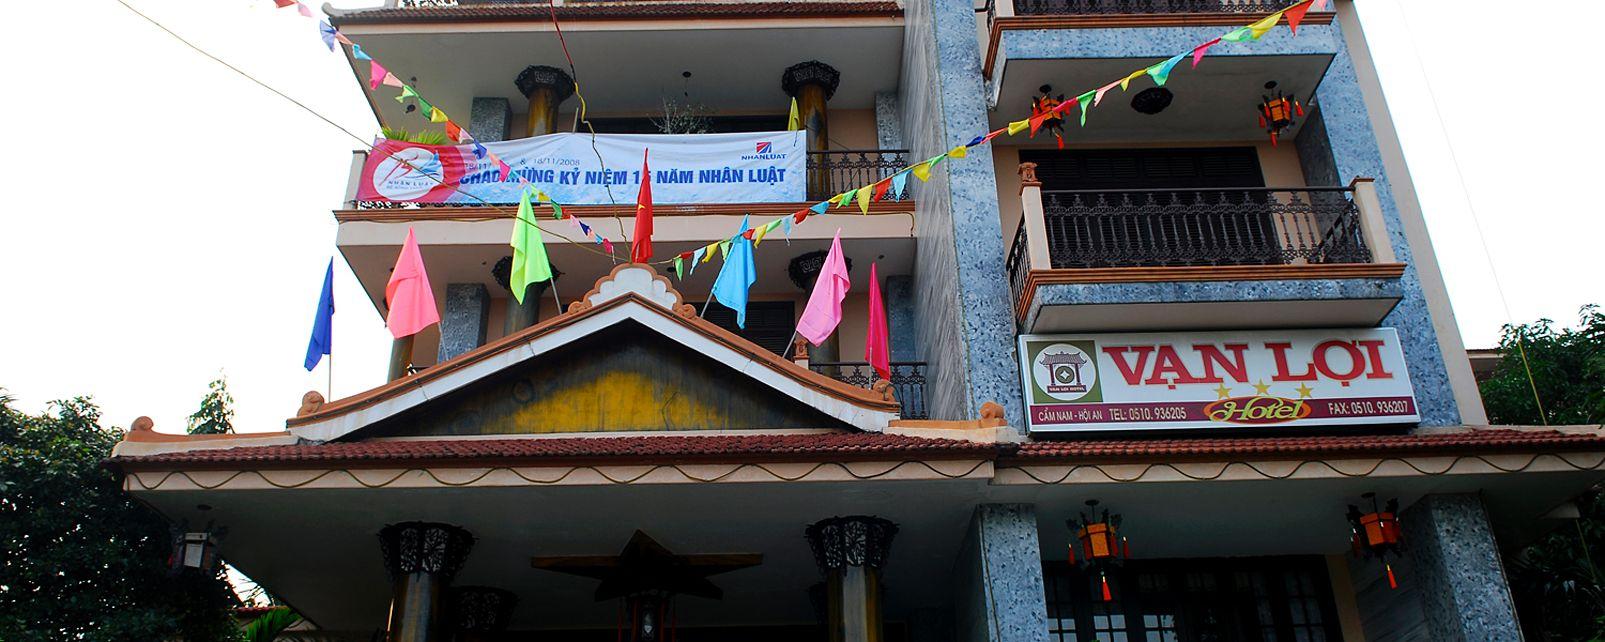 Hotel Van Loi